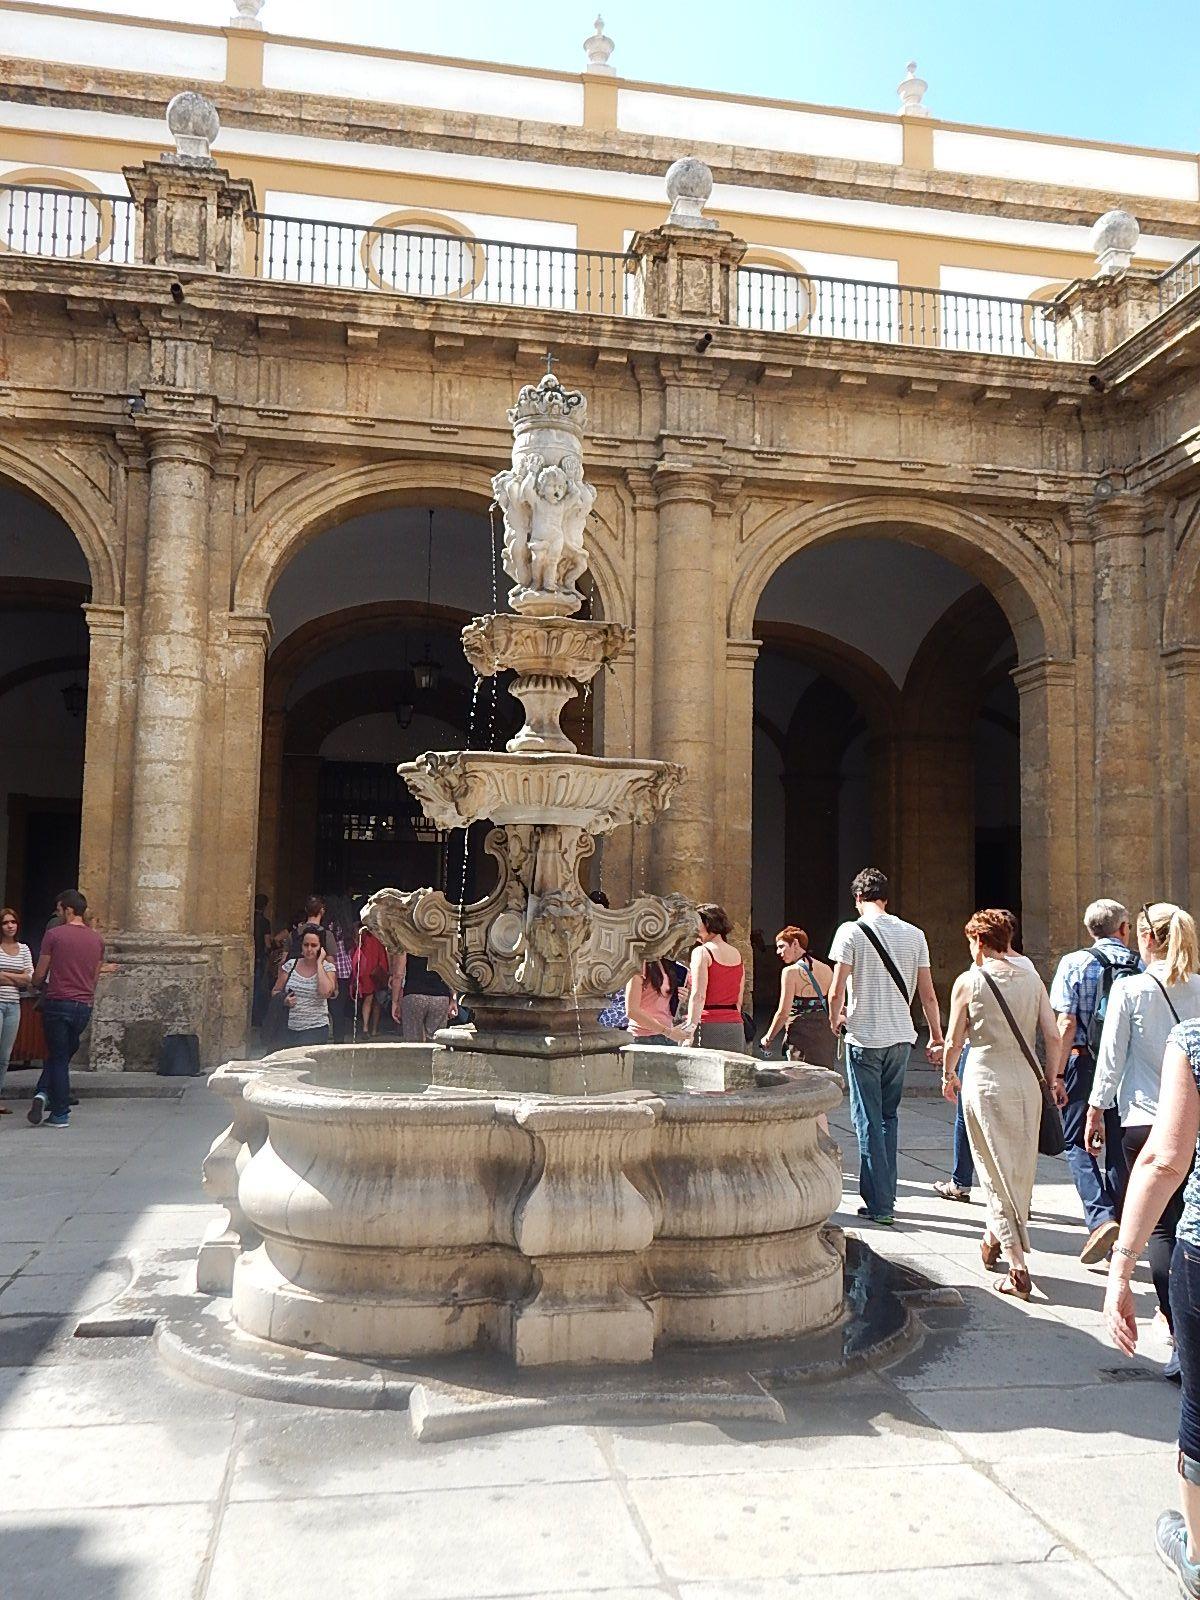 An ornate fountain in a Seville courtyard. Fountains